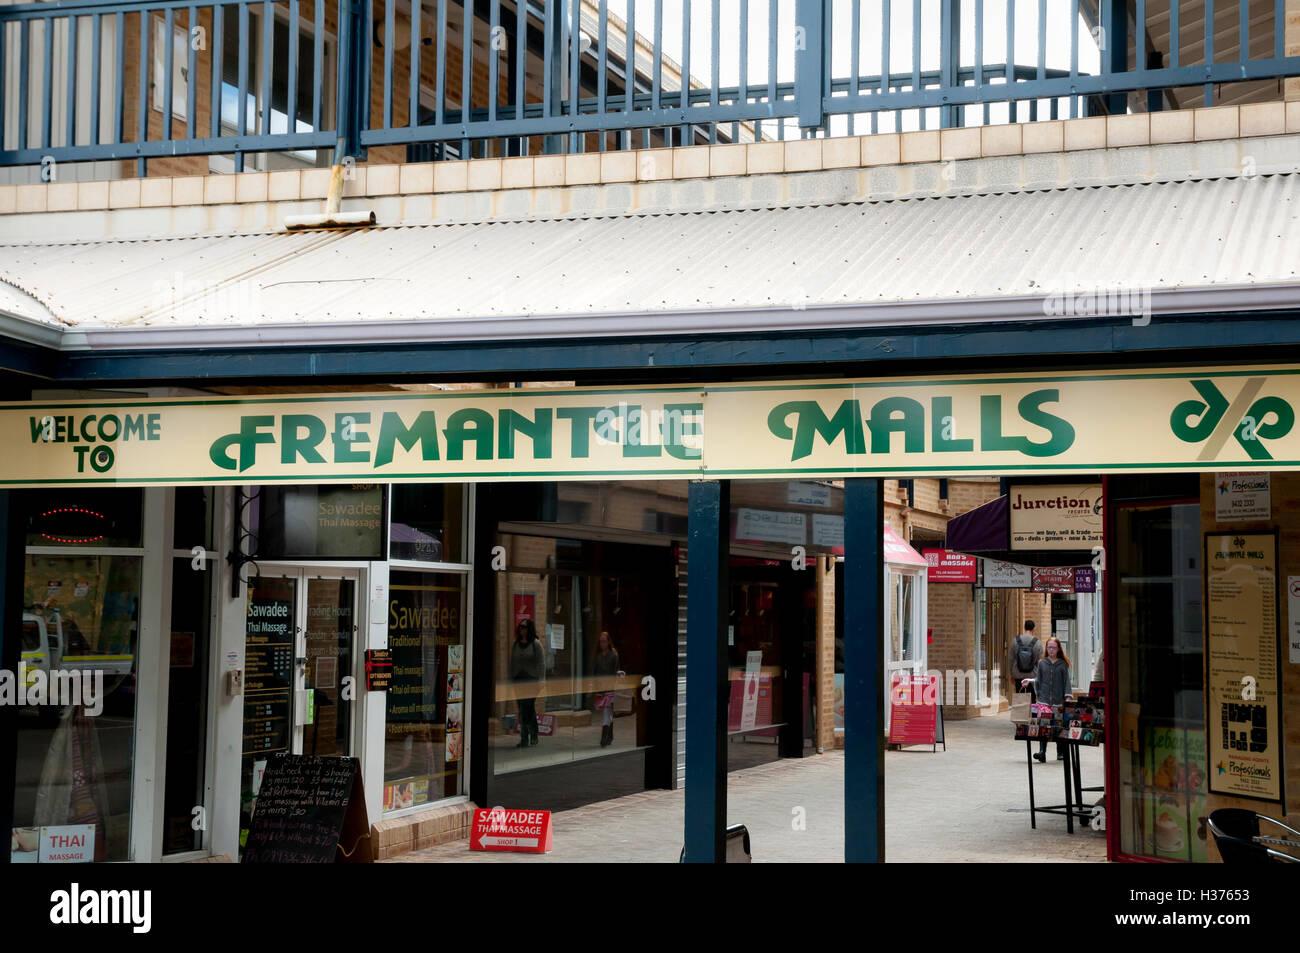 Fremantle Malls - Australia - Stock Image